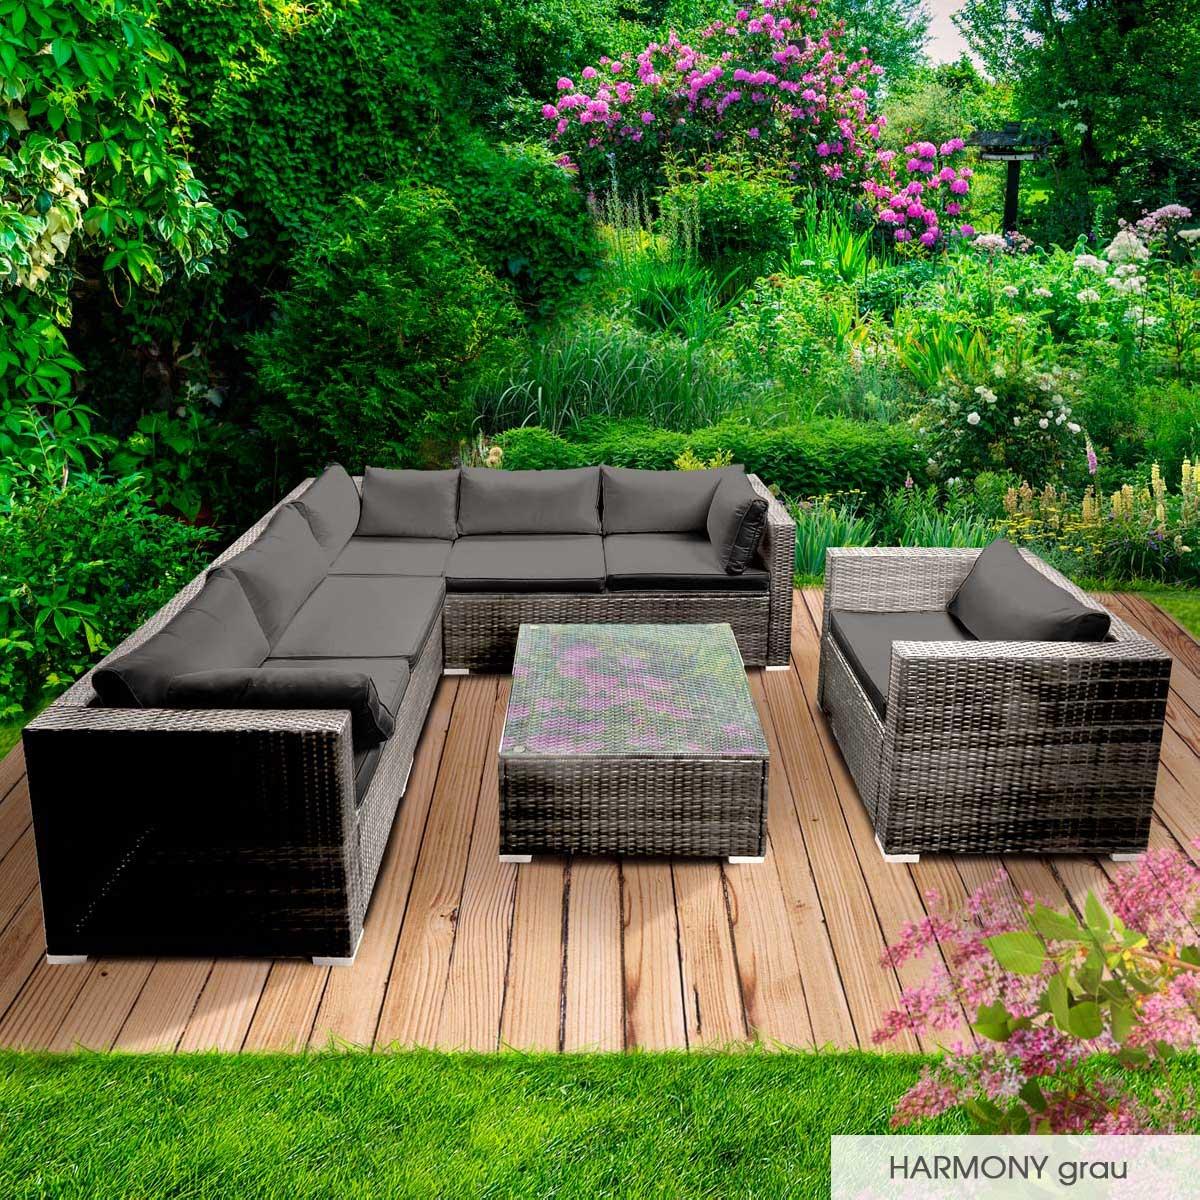 Gartenmoebel-Poly-Rattan-Lounge-Moebel-Sitzgarnitur-Gartengarnitur-Sitzgruppe-Sofa Indexbild 24